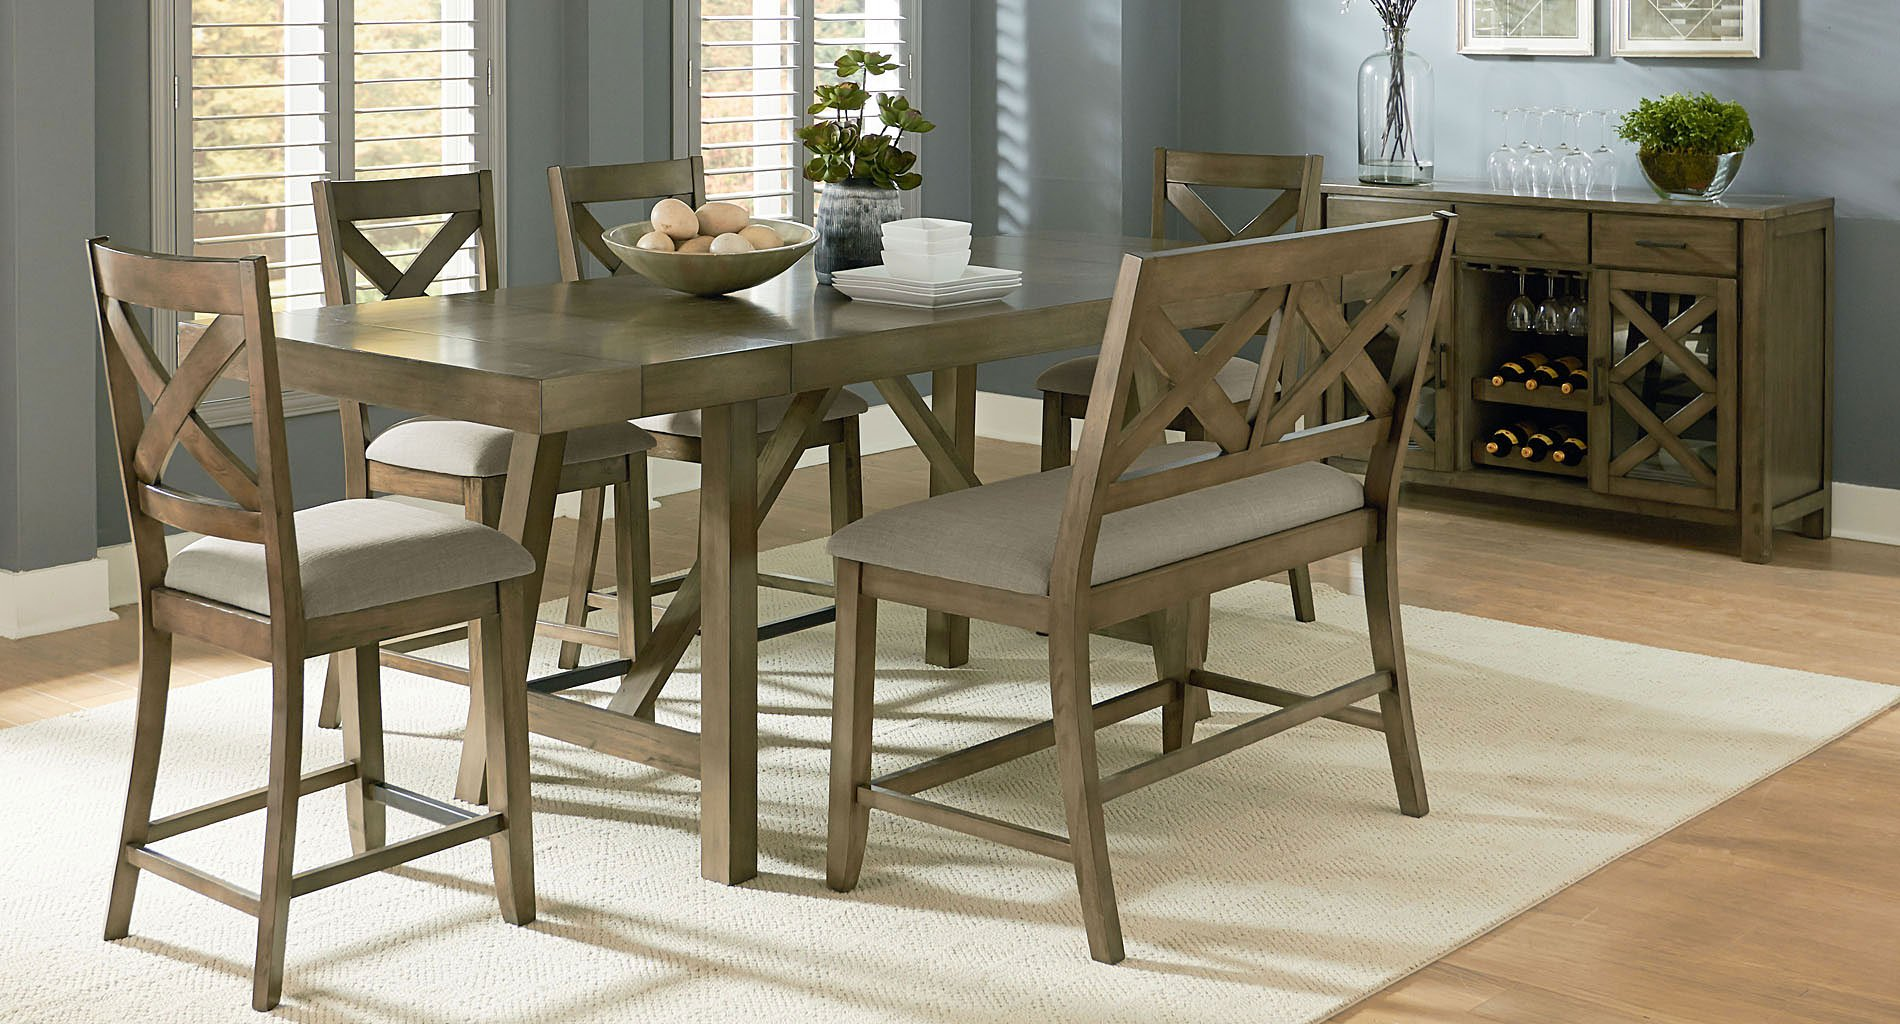 omaha counter height dining set w x back bench grey by standard furniture furniturepick. Black Bedroom Furniture Sets. Home Design Ideas